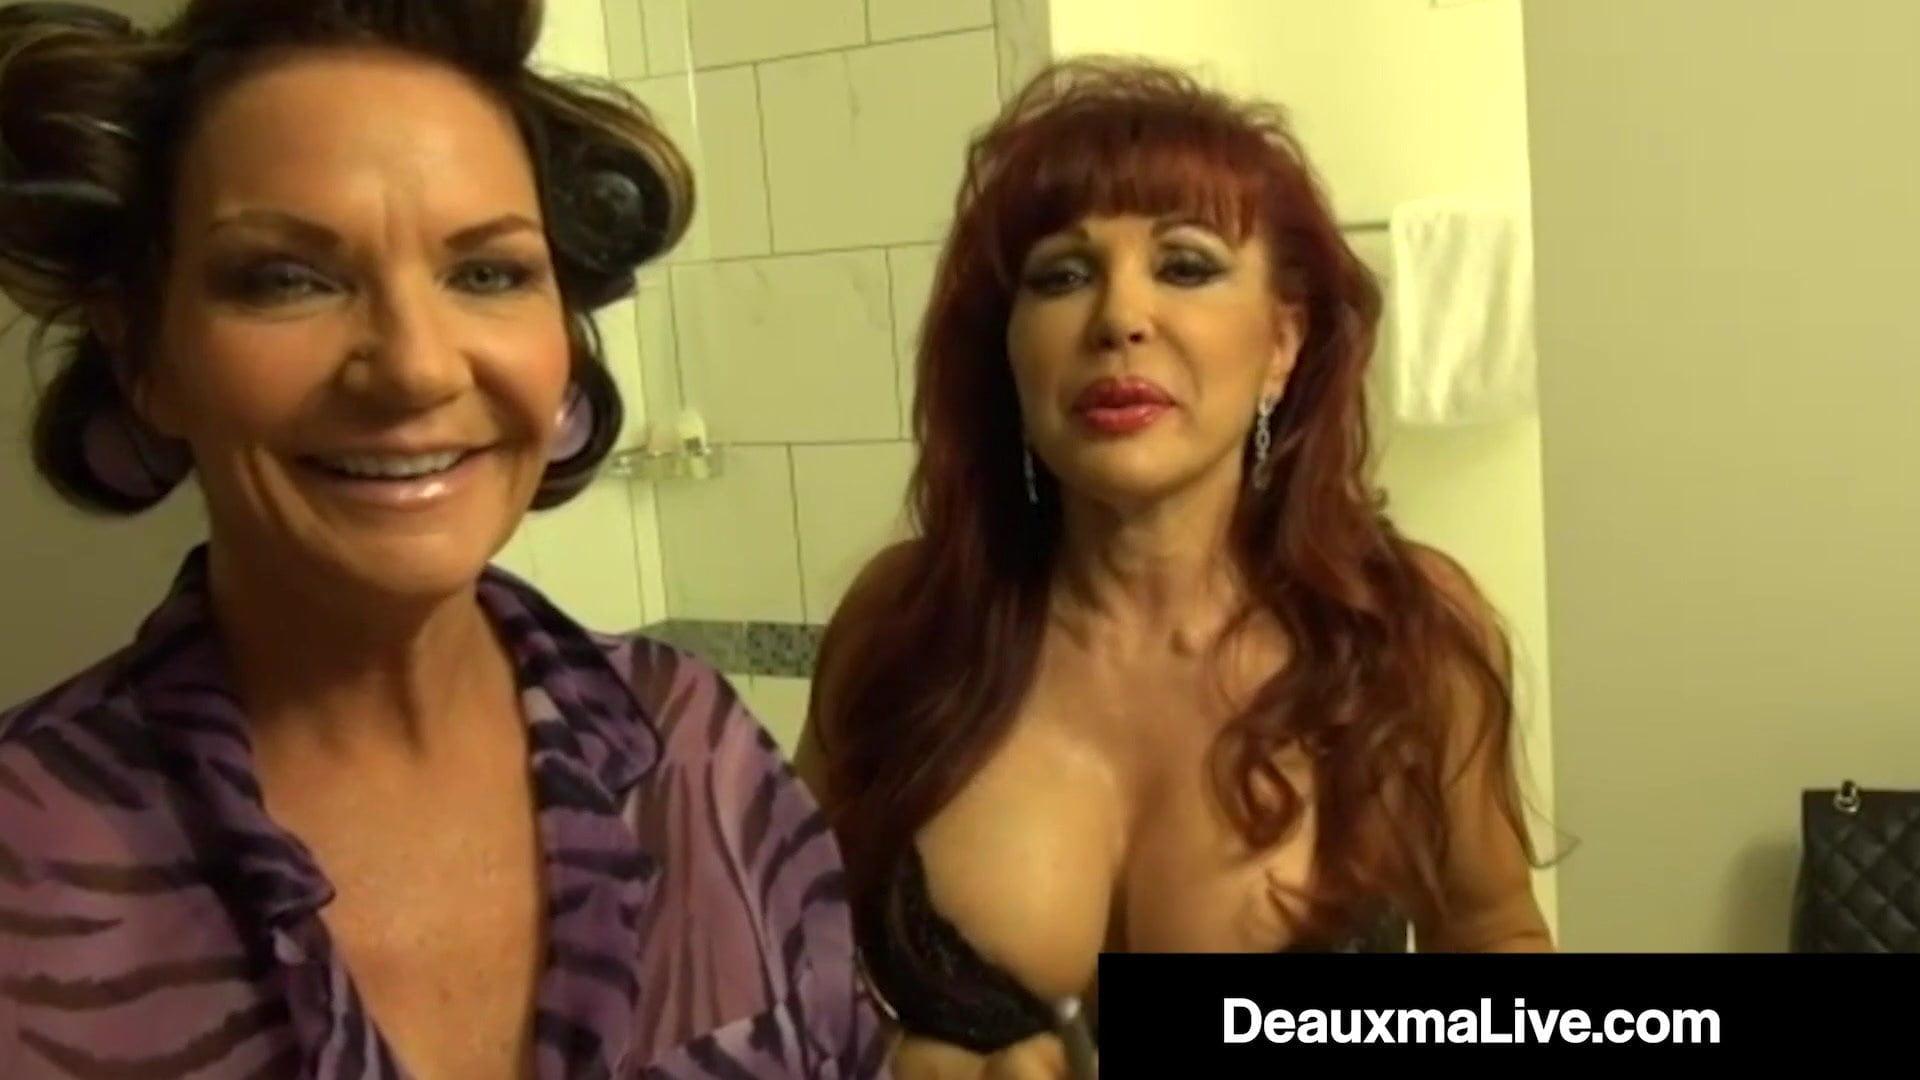 Busty Cougar Deauxma StrapOn Fucks Latina Milf Attractive Vanessa!